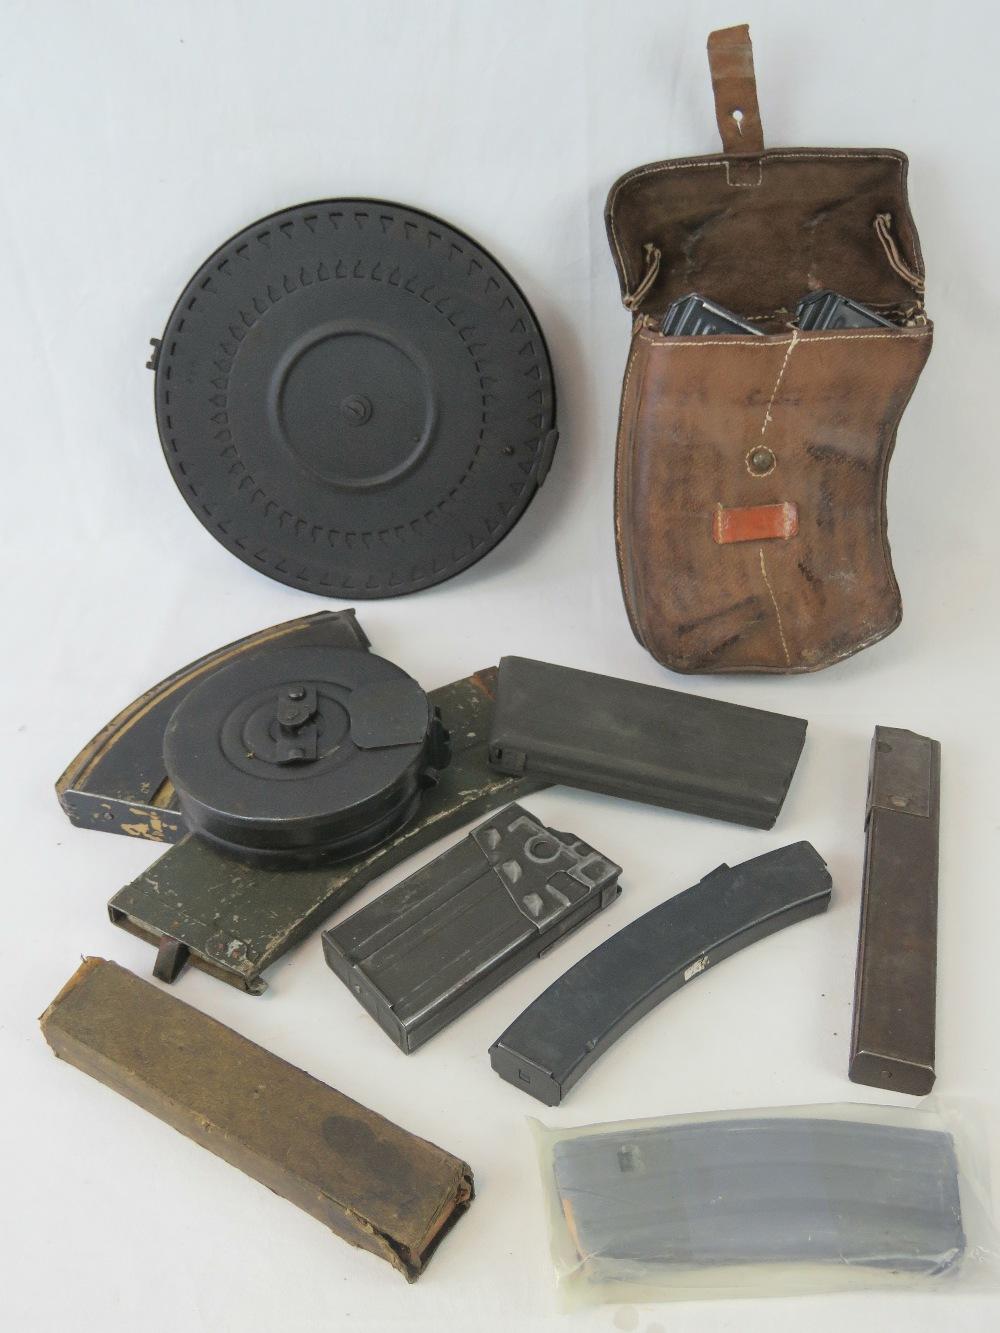 Lot 6 - A quantity of assorted machine gun magazines including; M16, PPsh41, H+K G3, Vz58, Sten, etc.